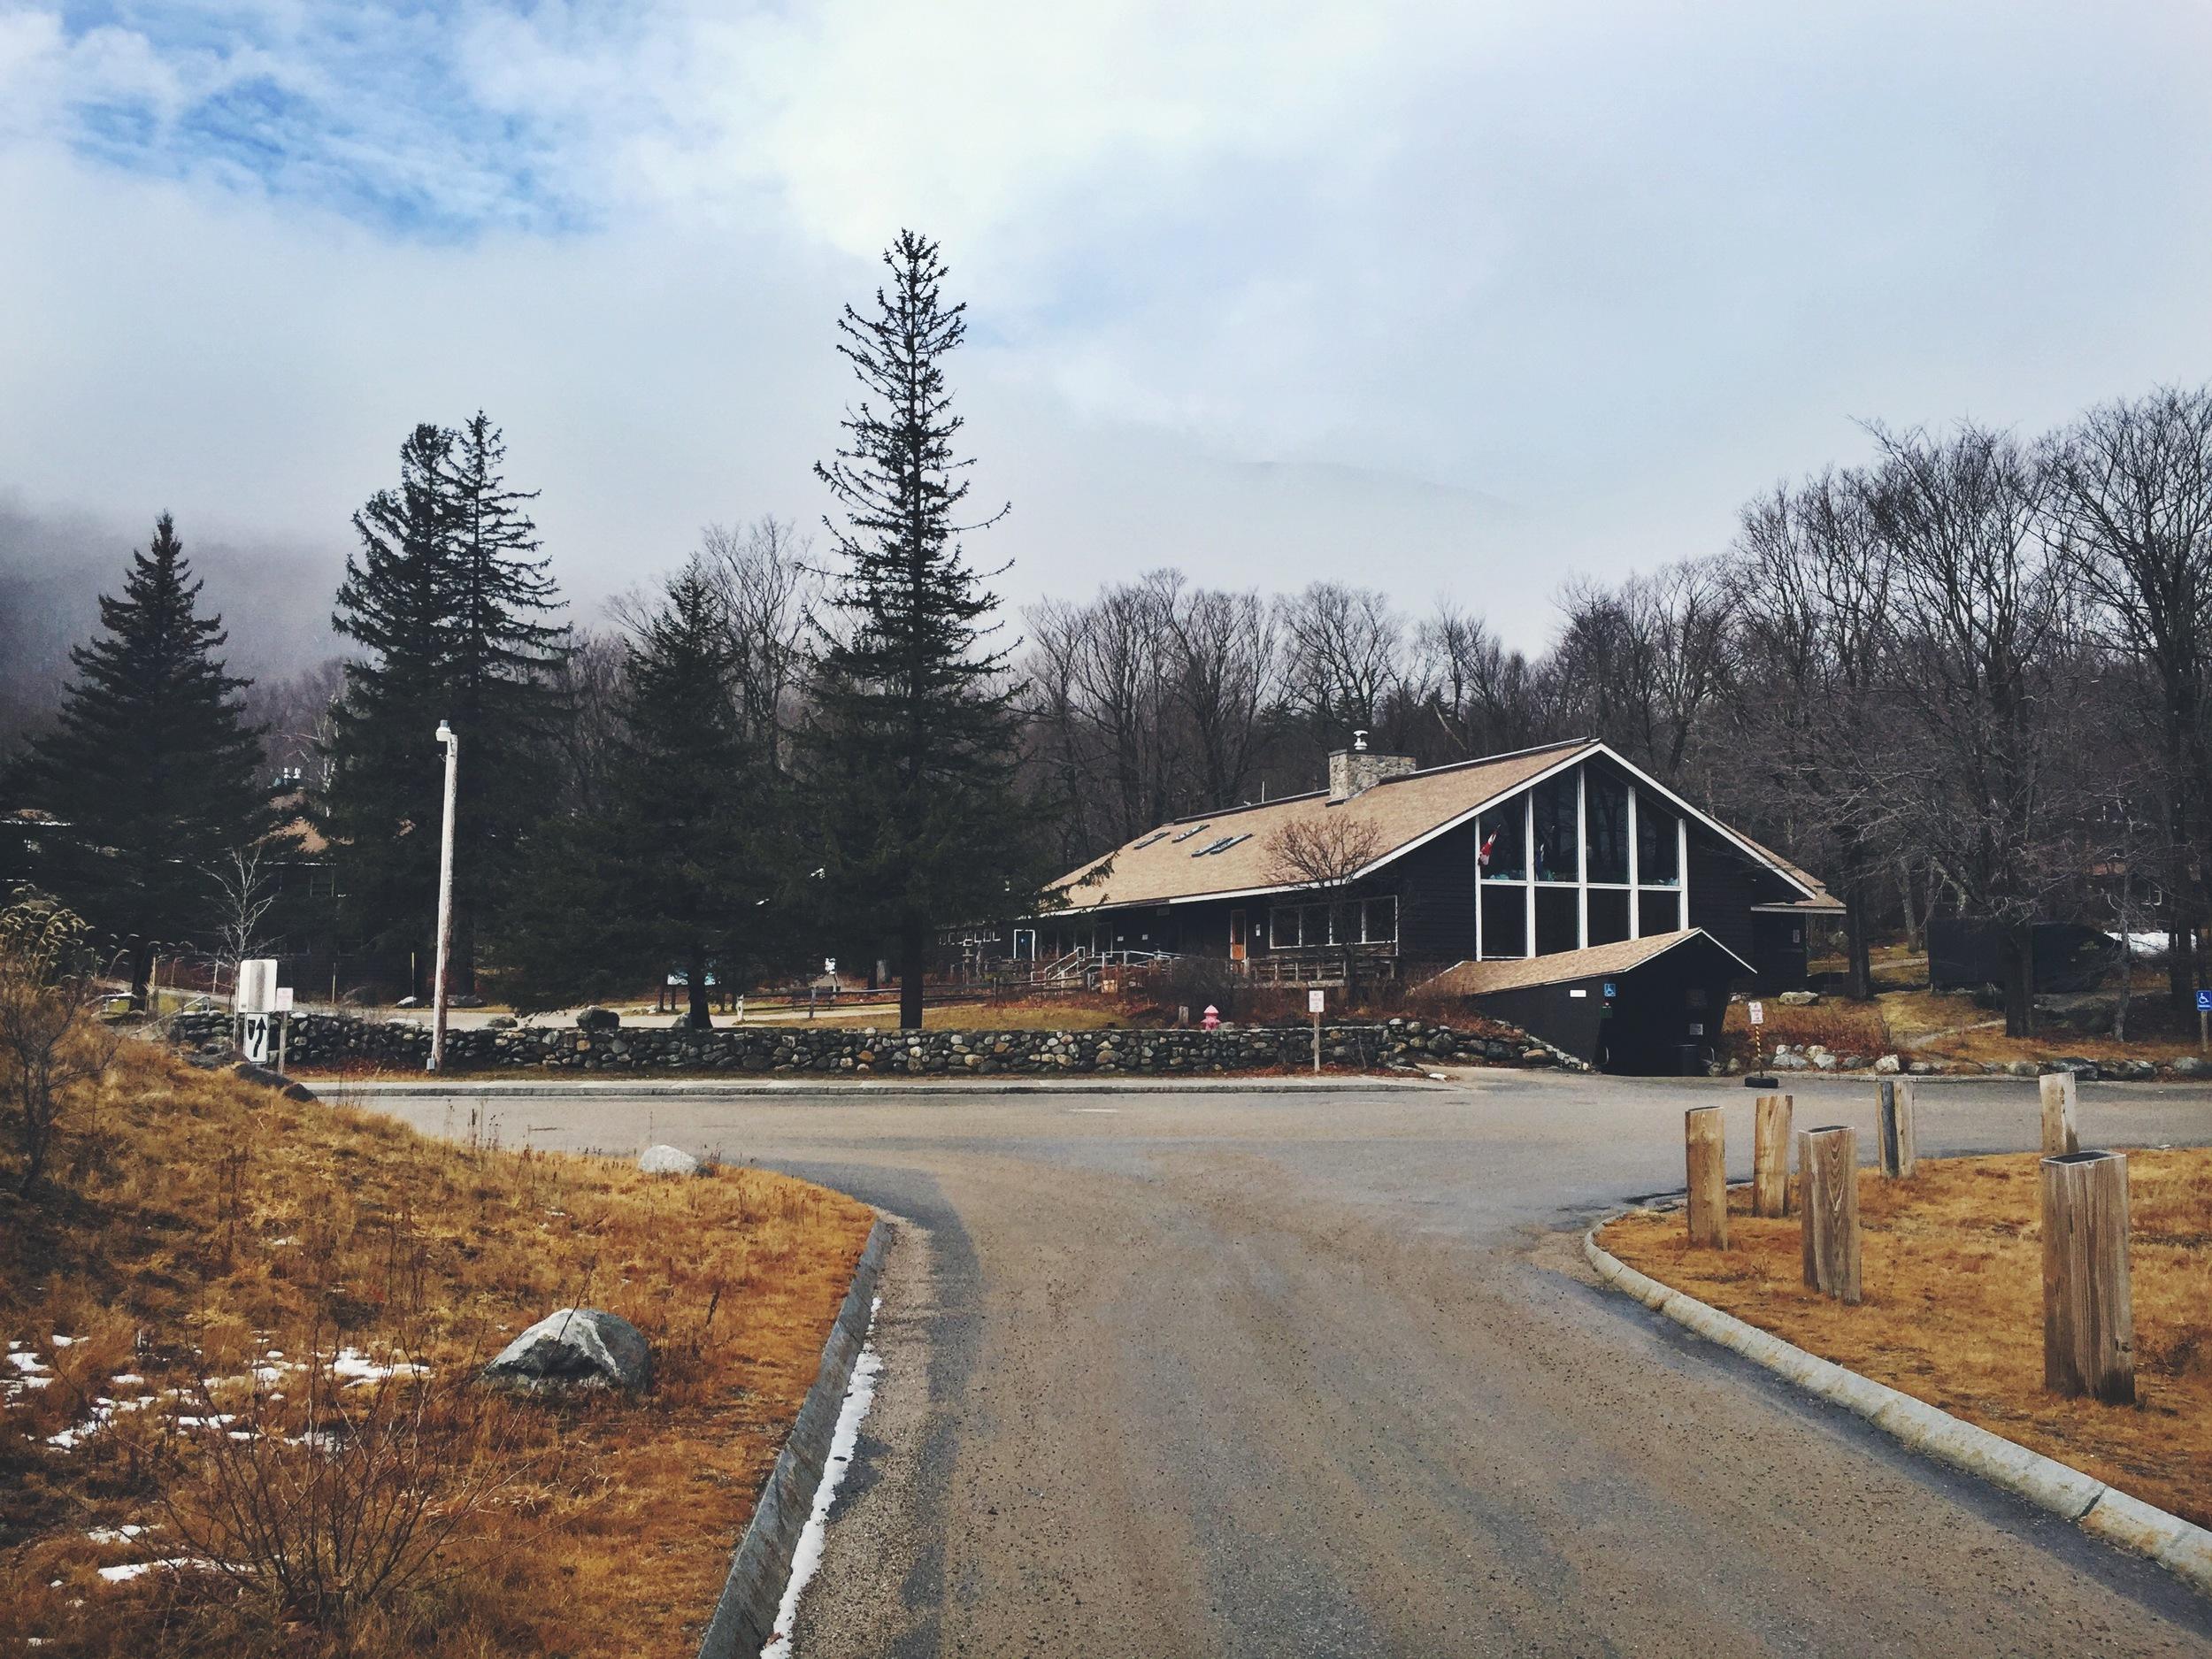 The Pinkham Notch Visitor Center